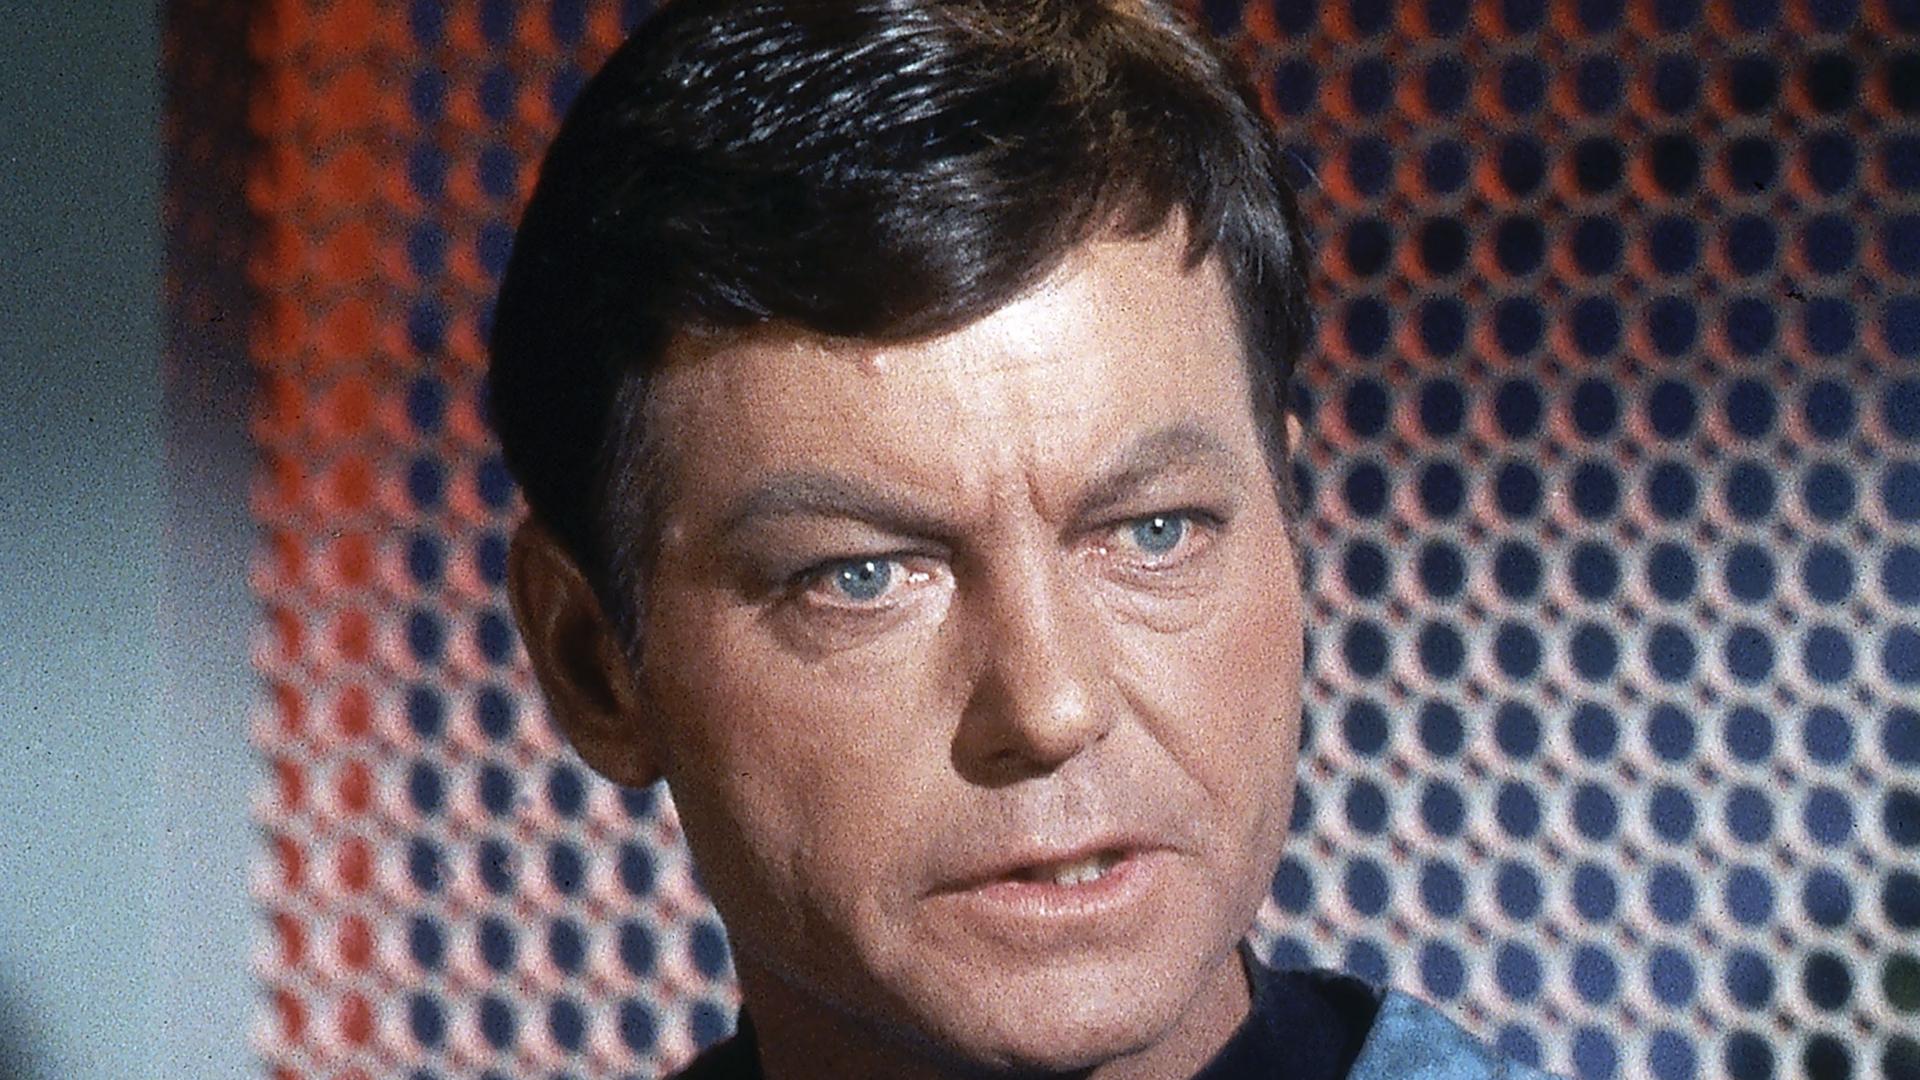 Dr Leonard 'Bones' McCoy